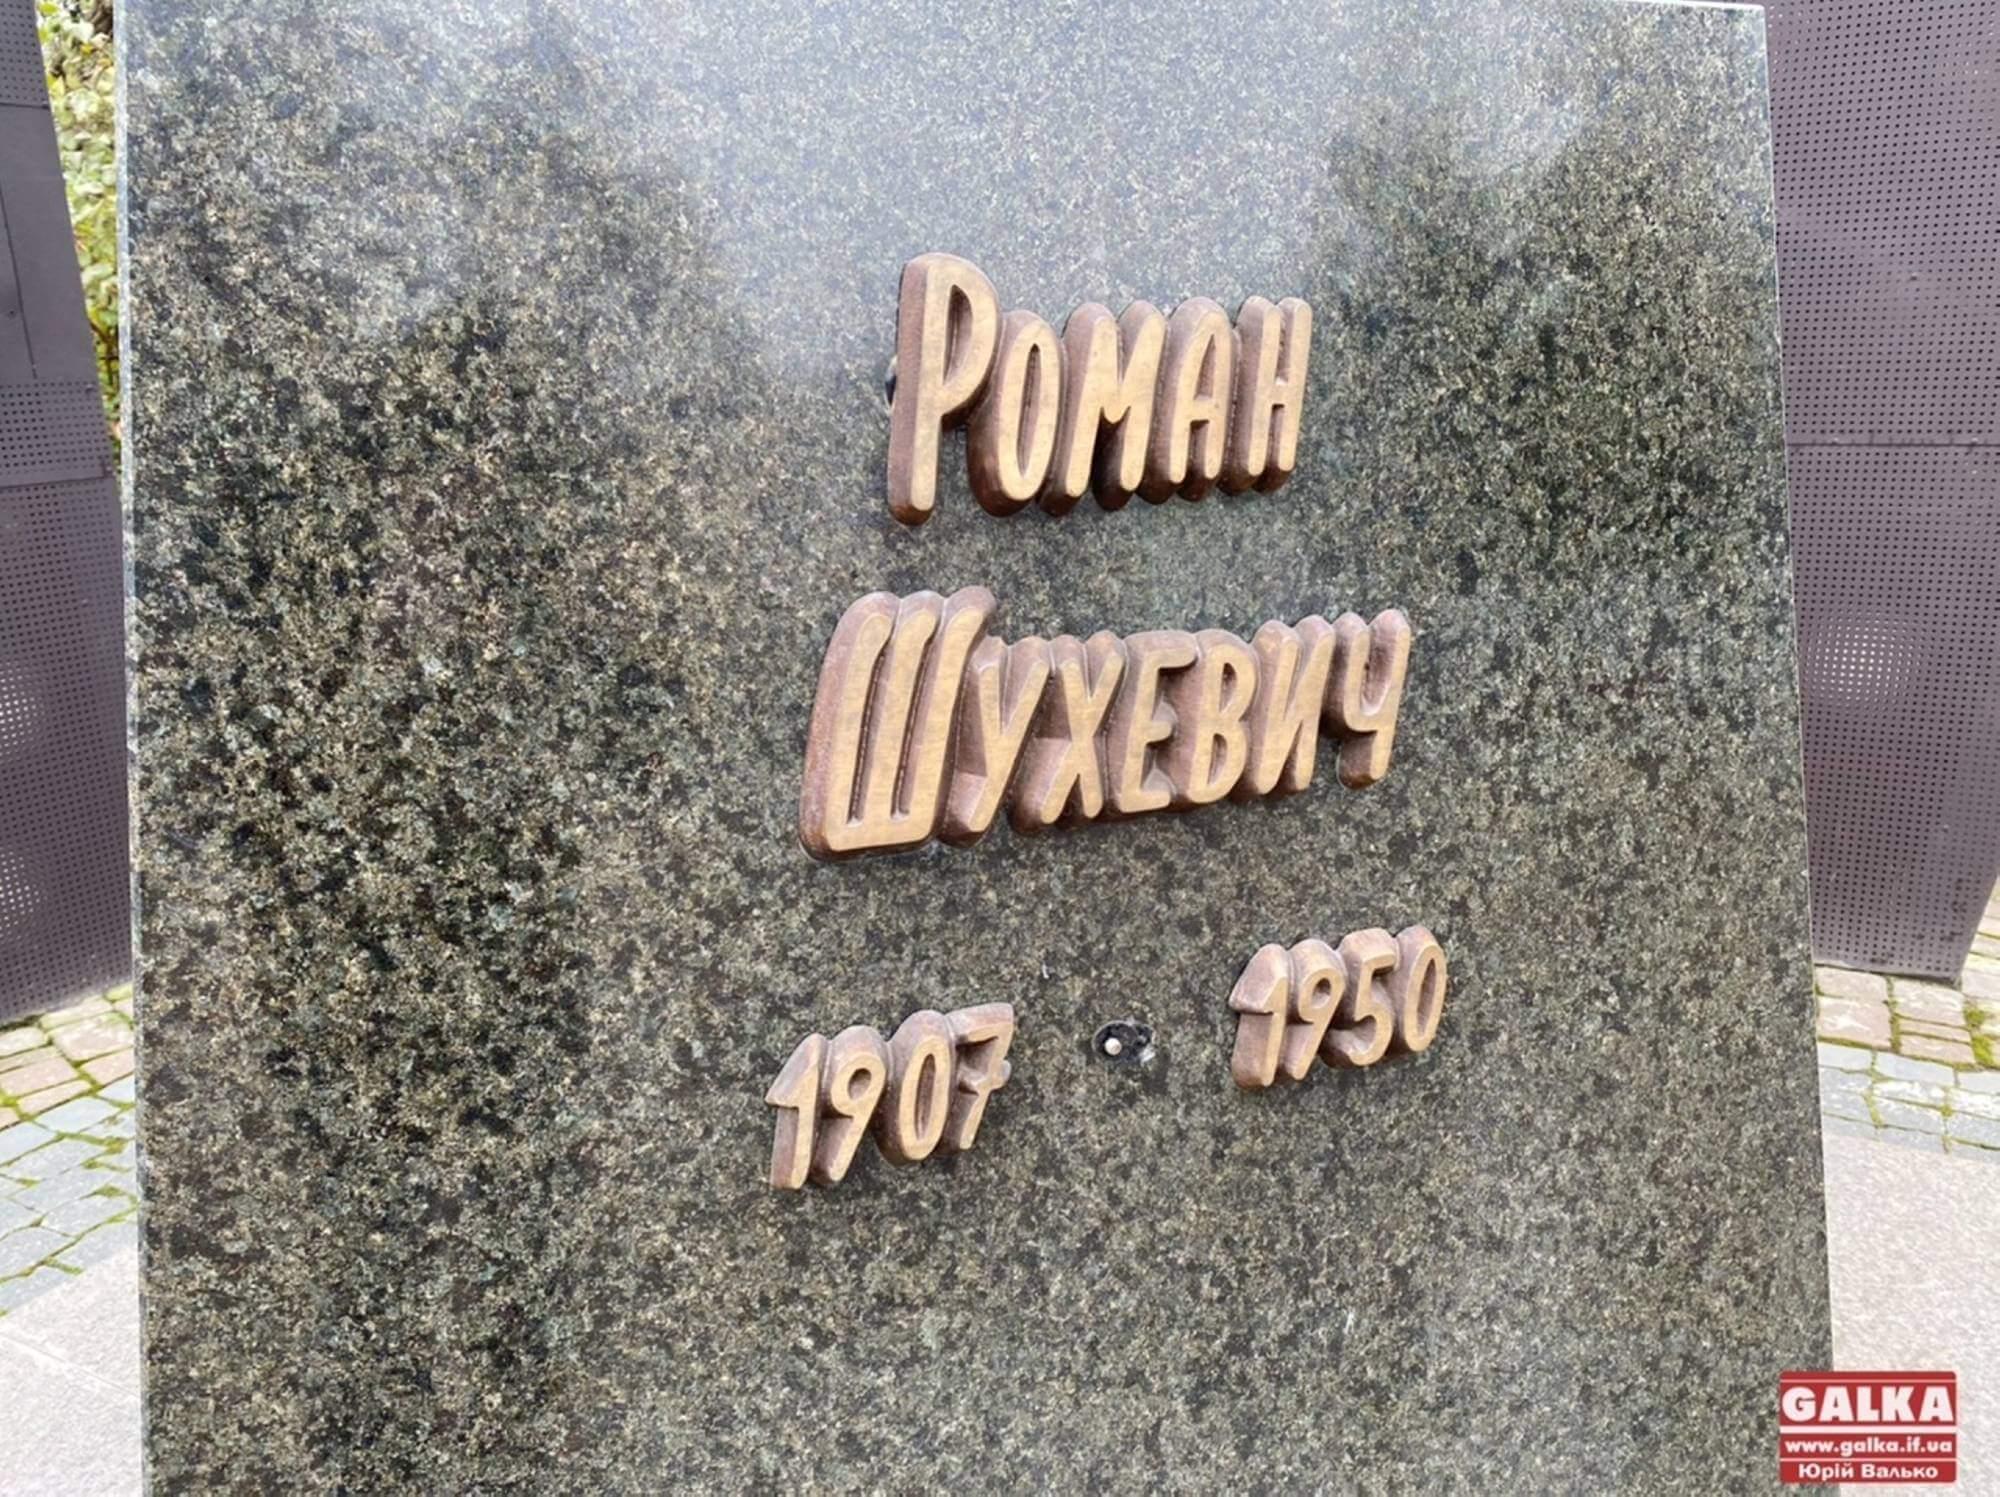 У Франківську пошкодили постамент пам'ятника Роману Шухевичу (ФОТО)